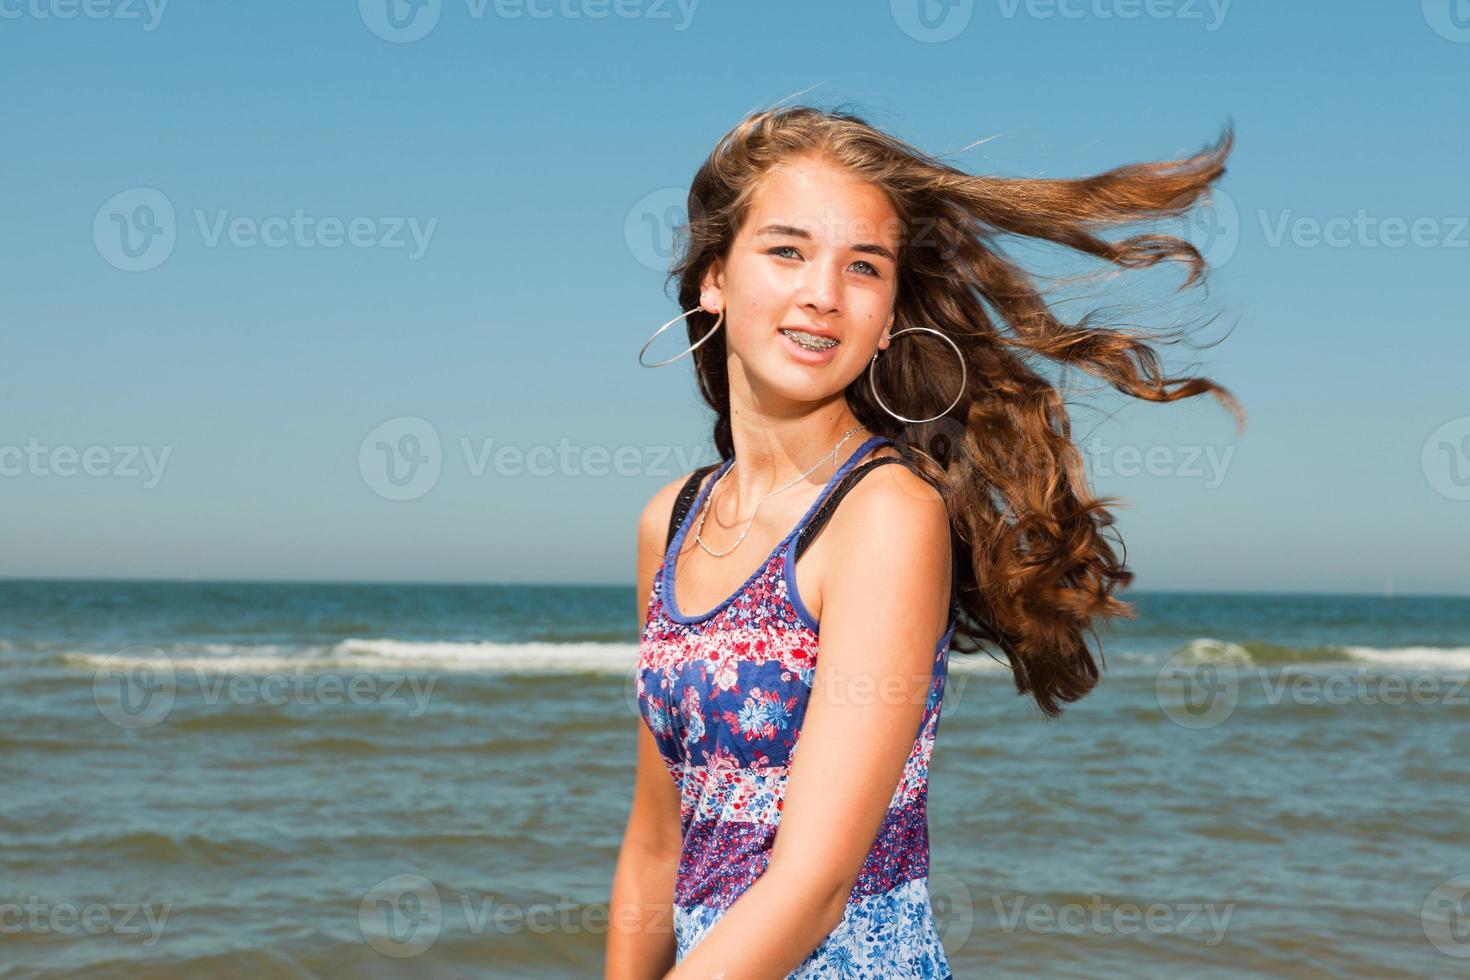 Happy girl with long brown hair enjoying the refreshing beach. photo